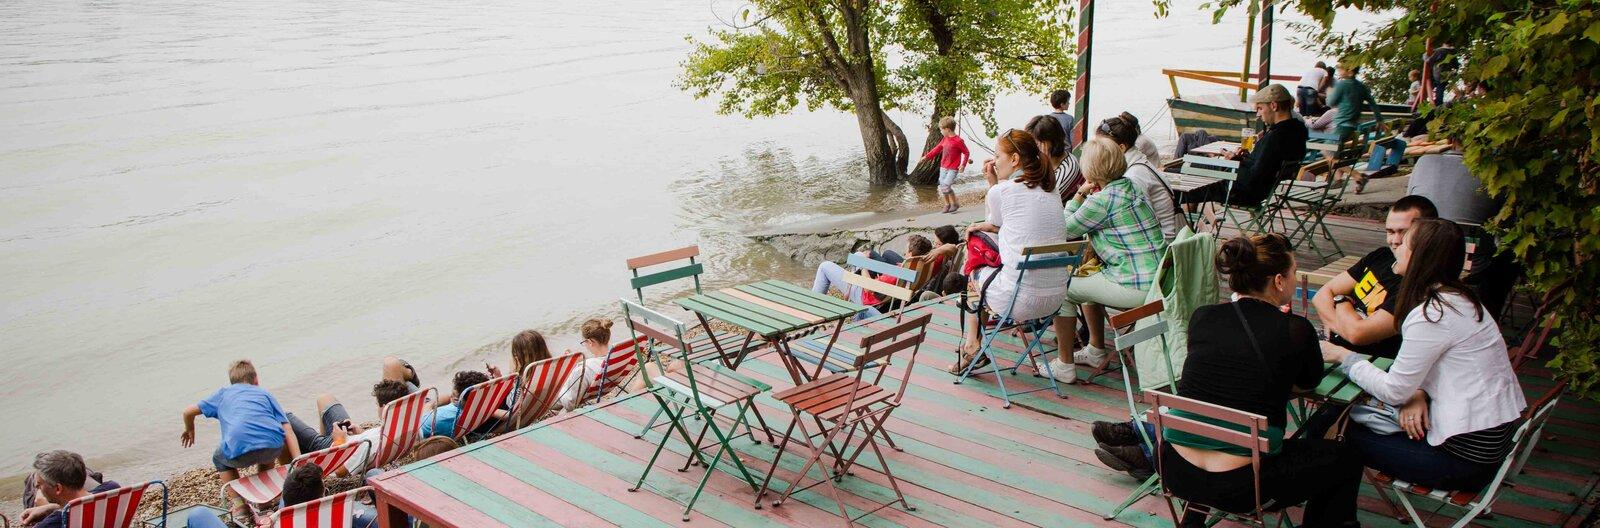 8 brilliant Buda-side bars on the Danube riverbank